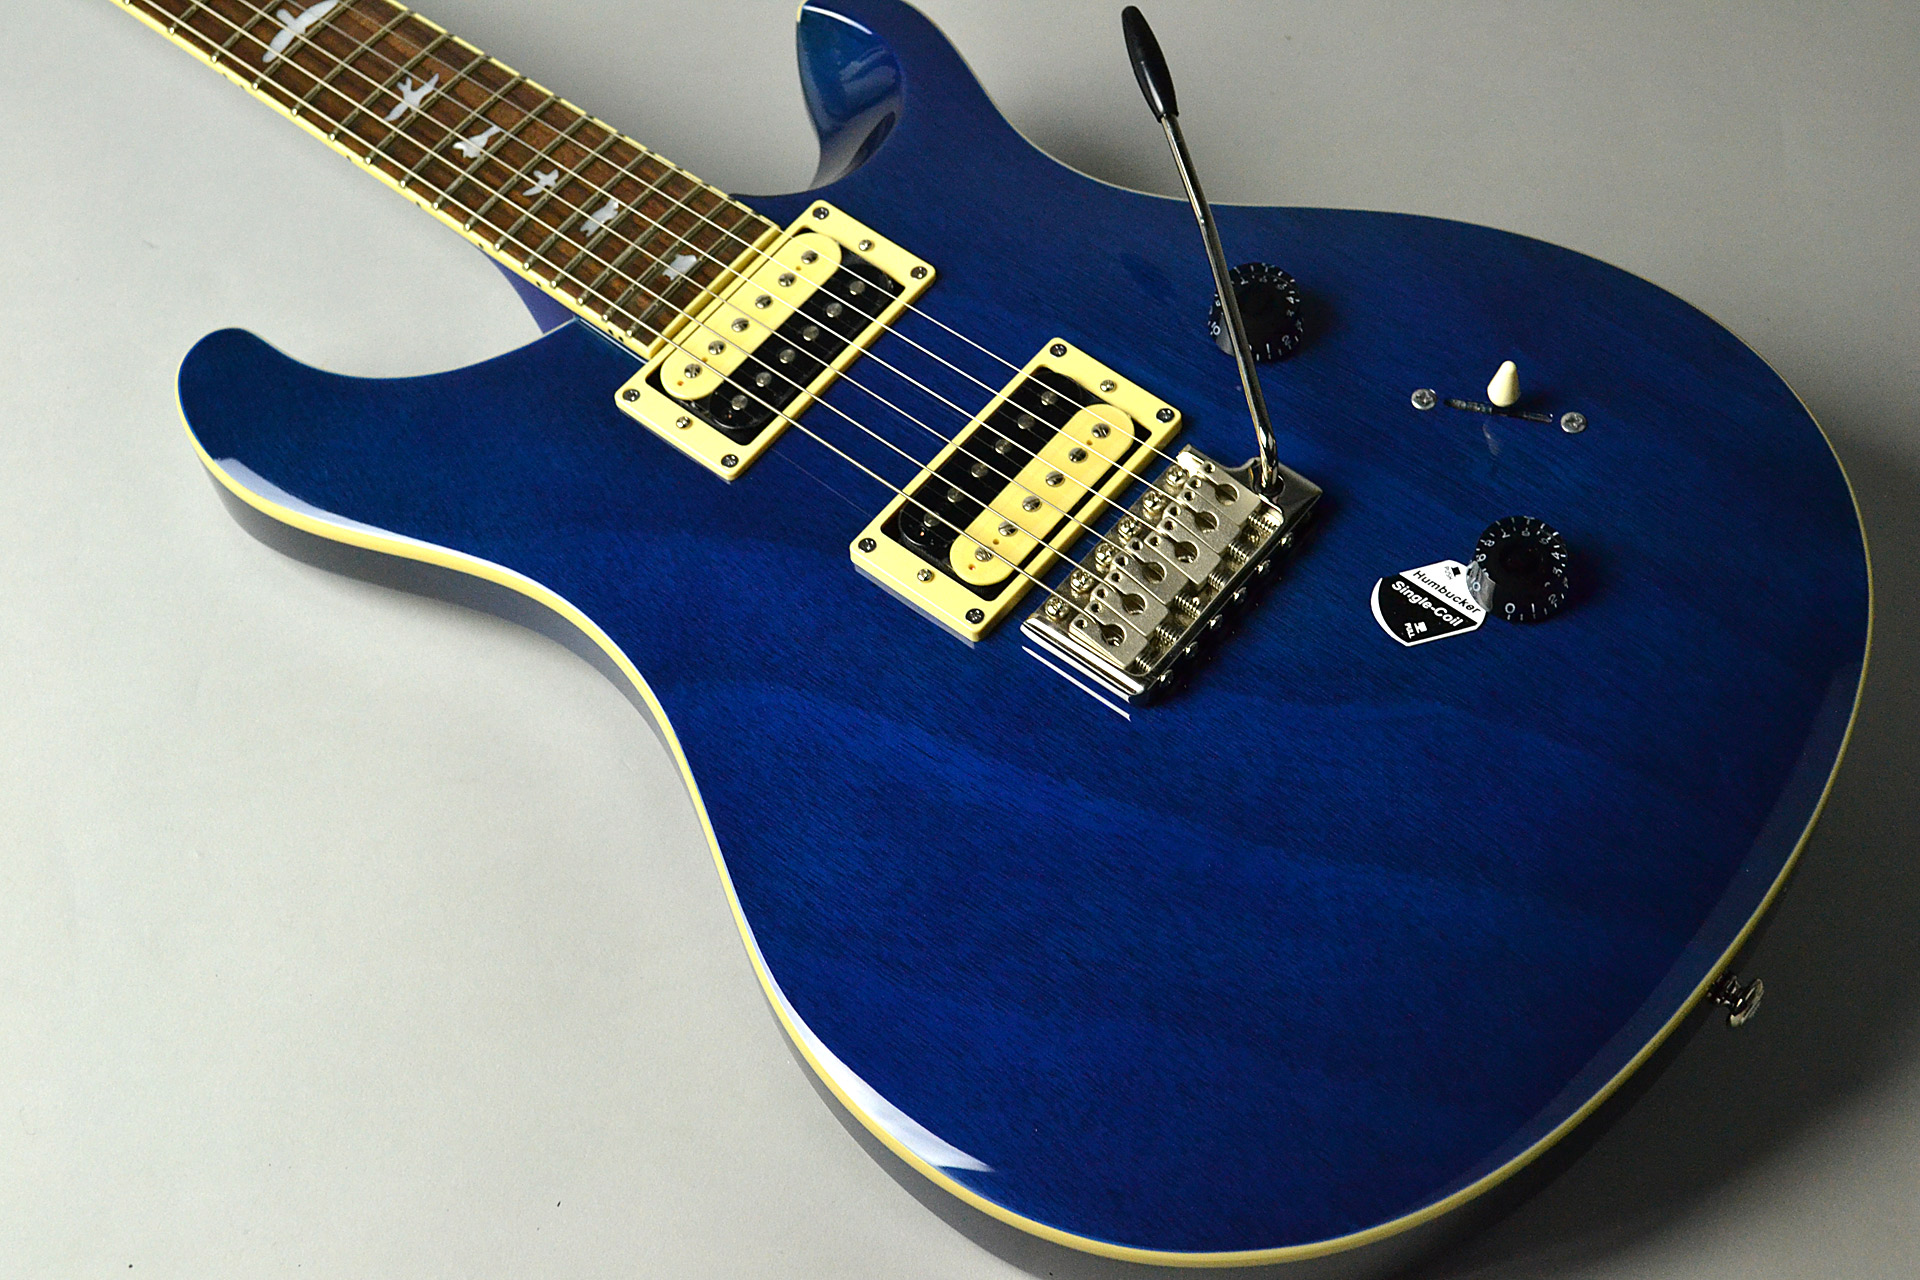 SE Standard 24 N TB/ Translucent Blueの全体画像(縦)